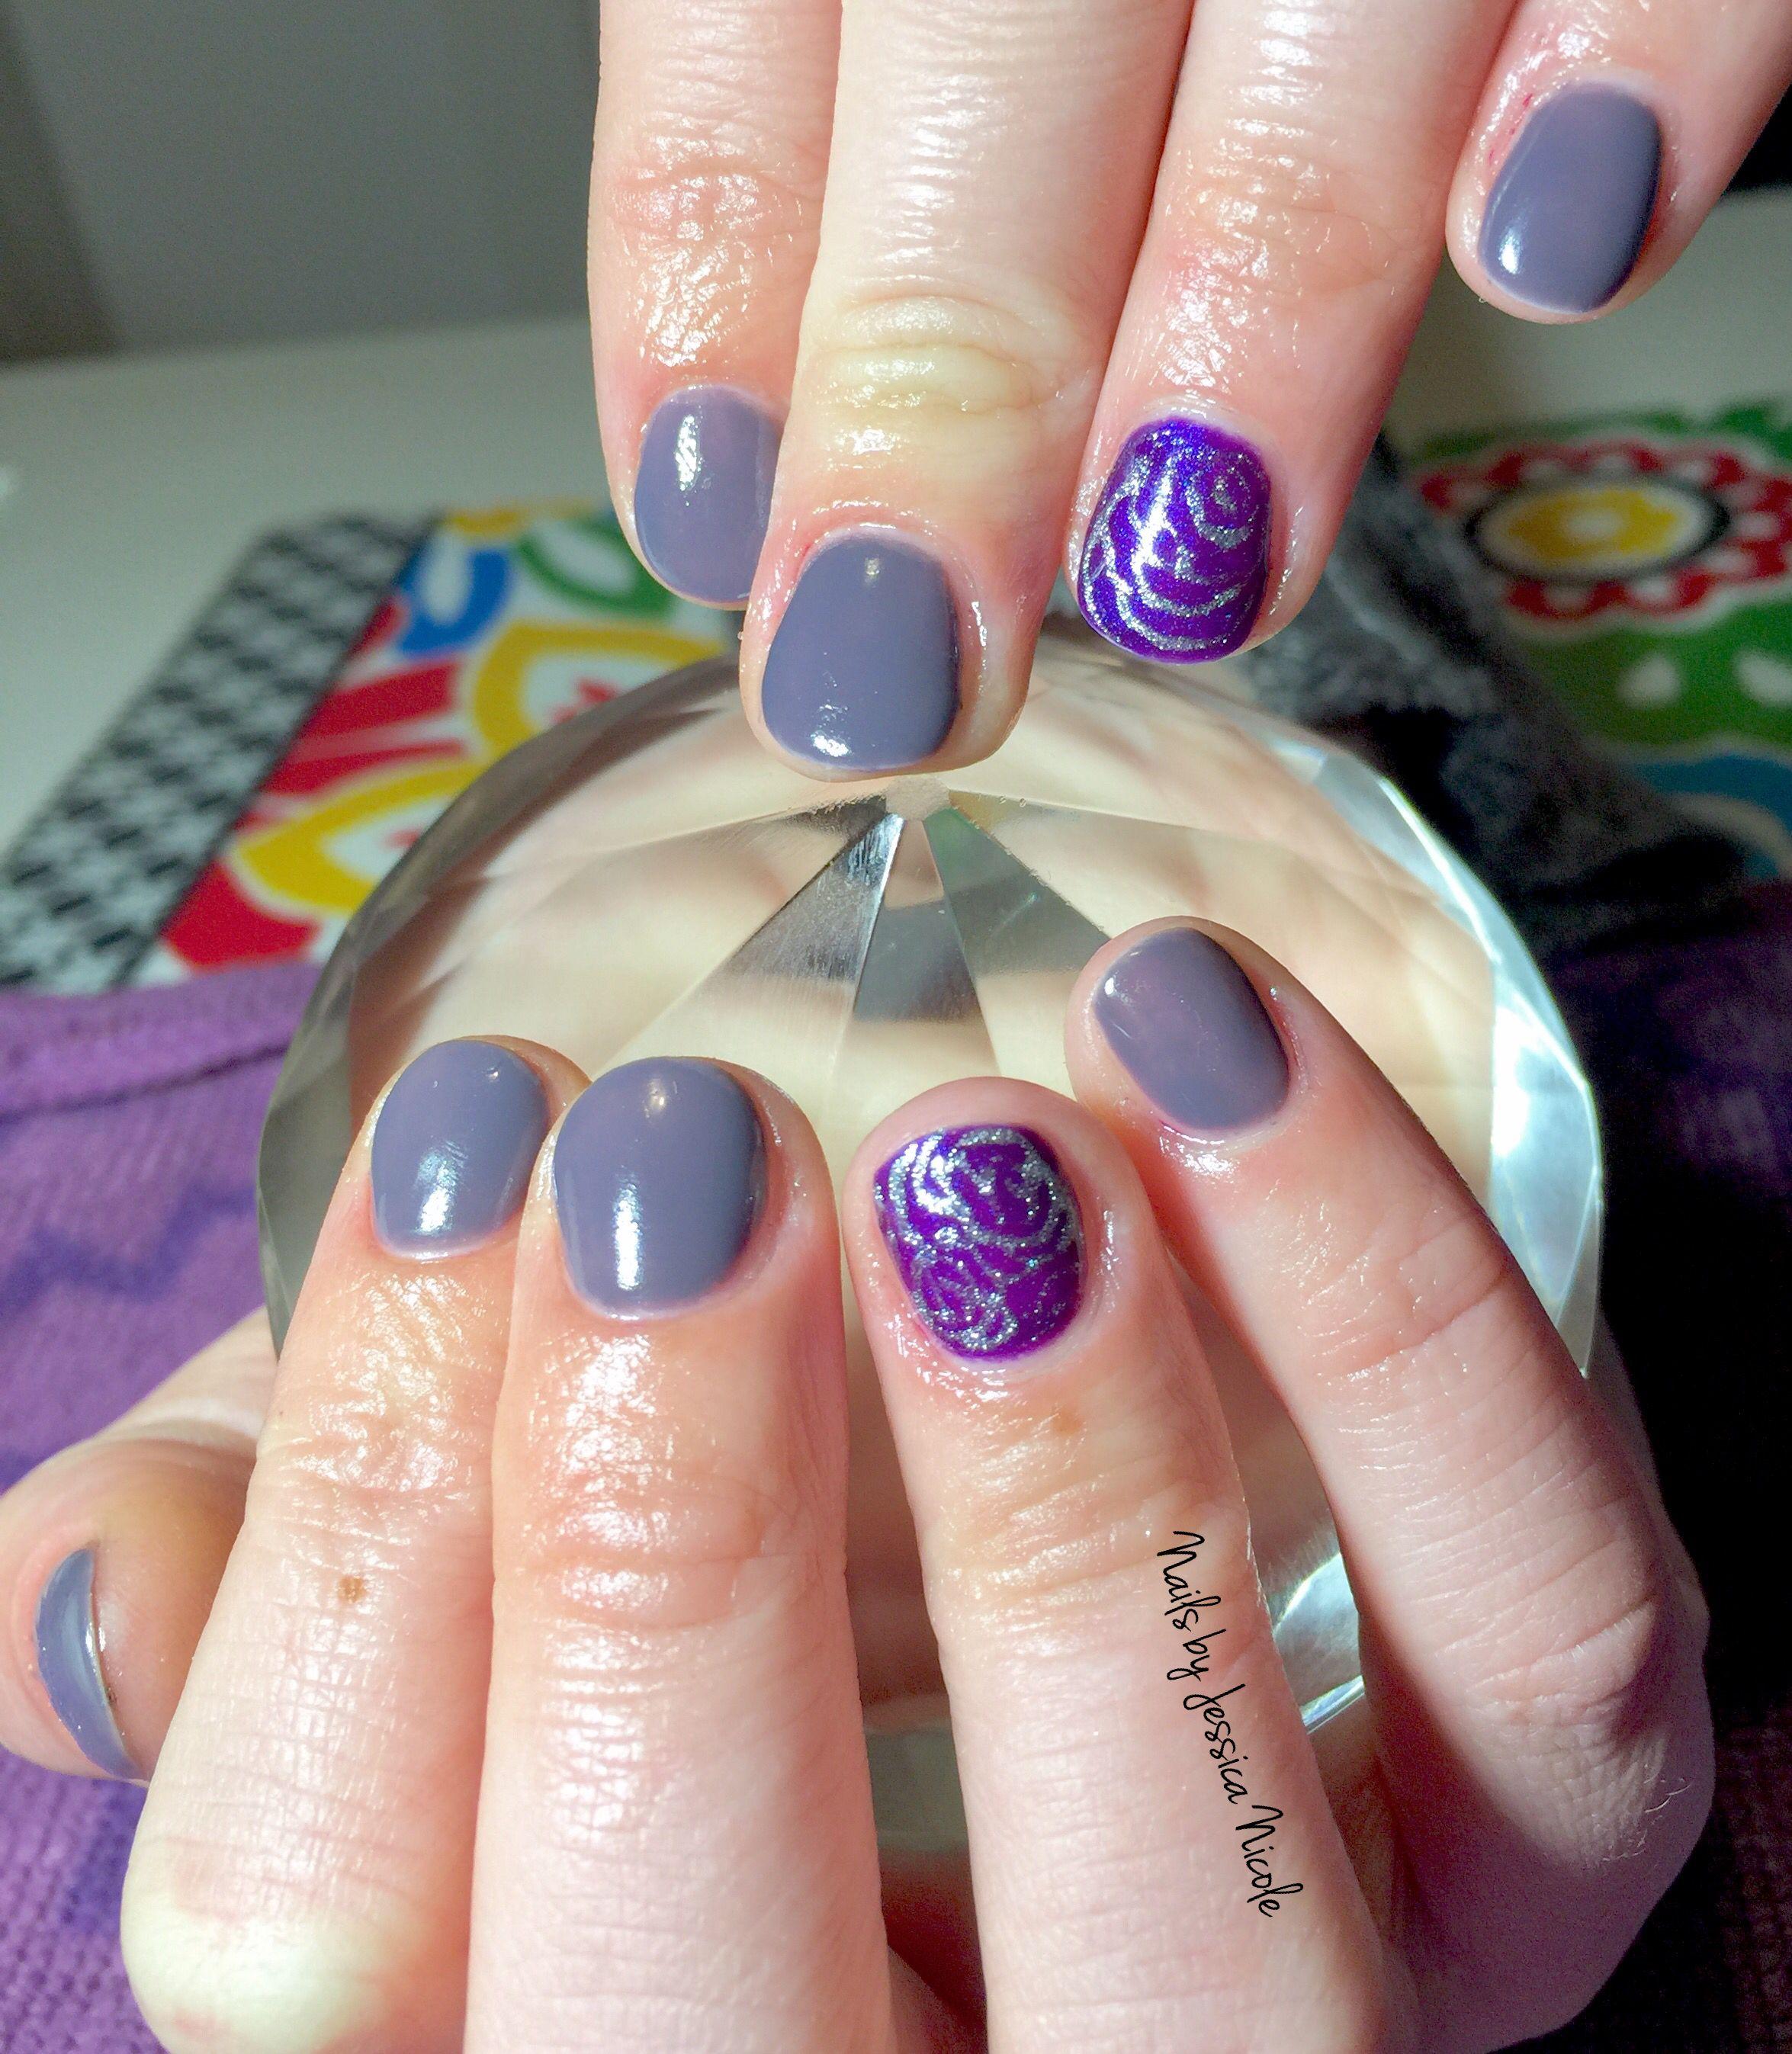 gorgeous purple & silver gel polish mani | acrylic & gel nail art